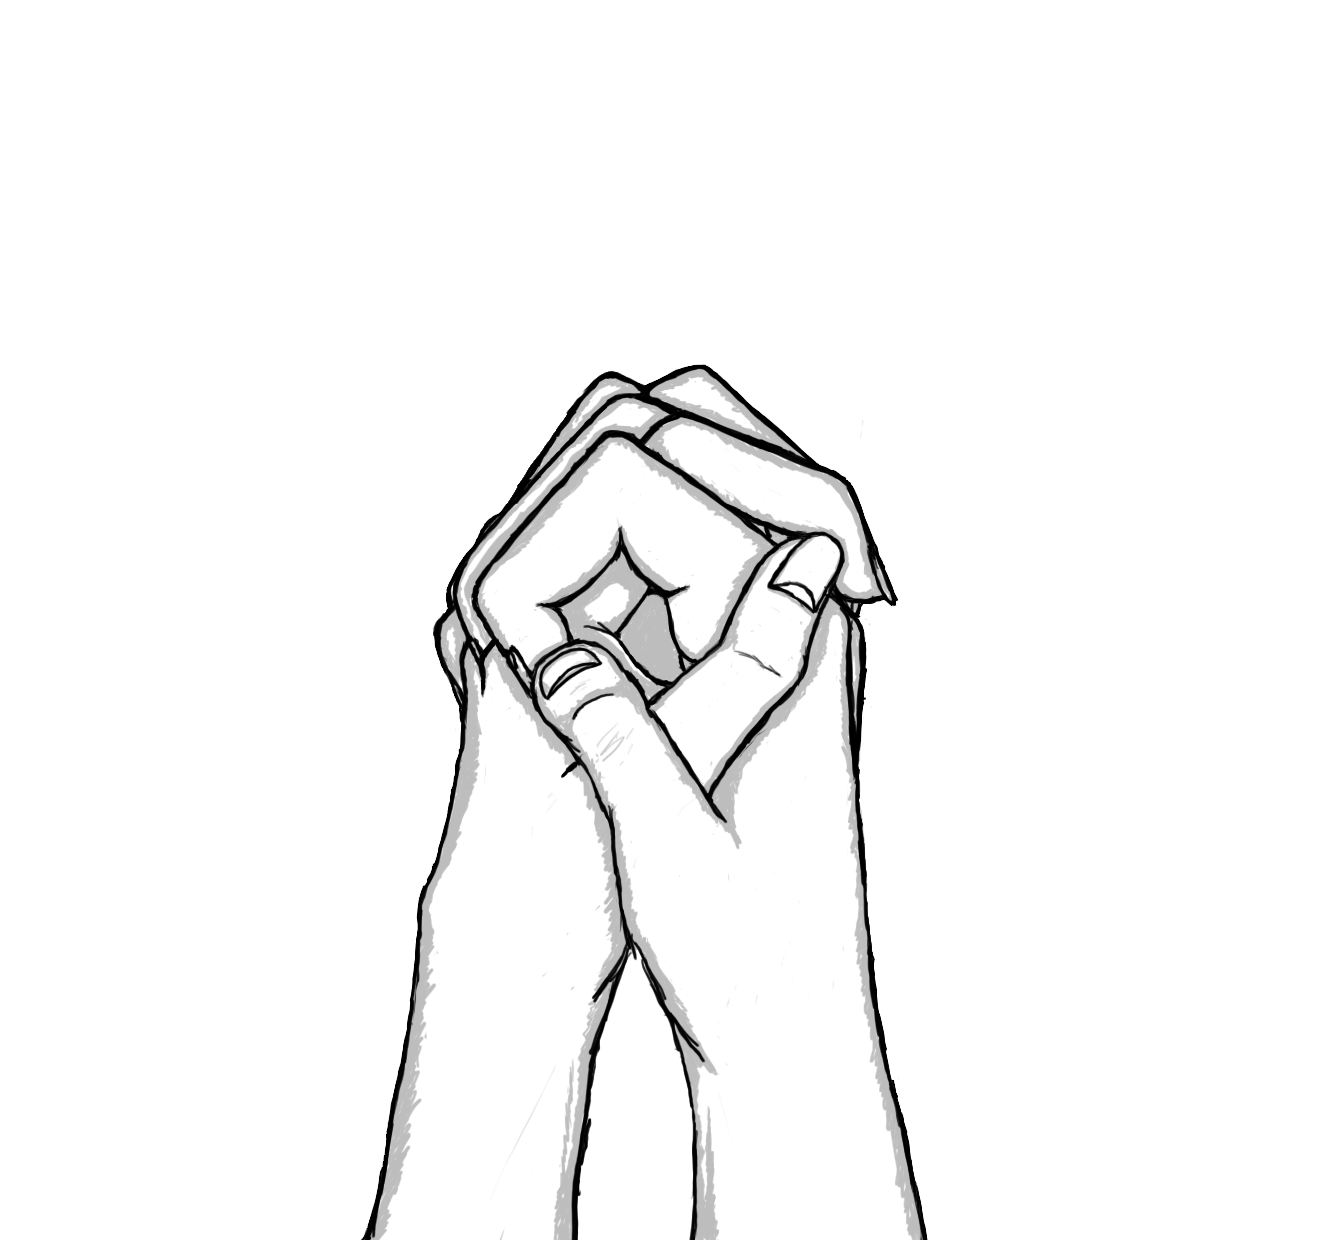 1320x1240 drawings of people in love holding hands 2 by pspleo digital art